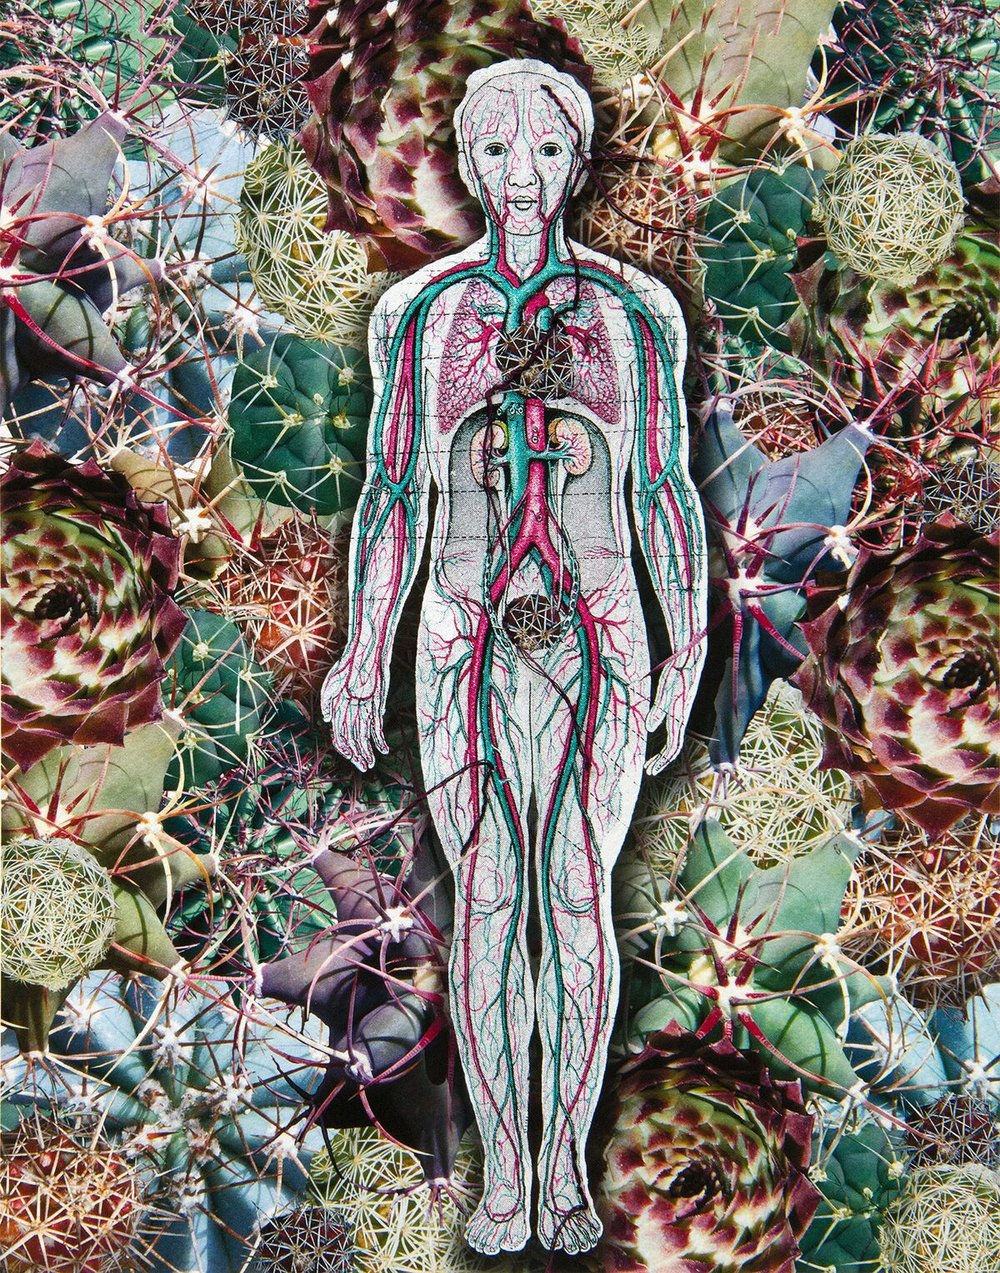 Embittered Heart, Mujar Sula ©Sandra Klein